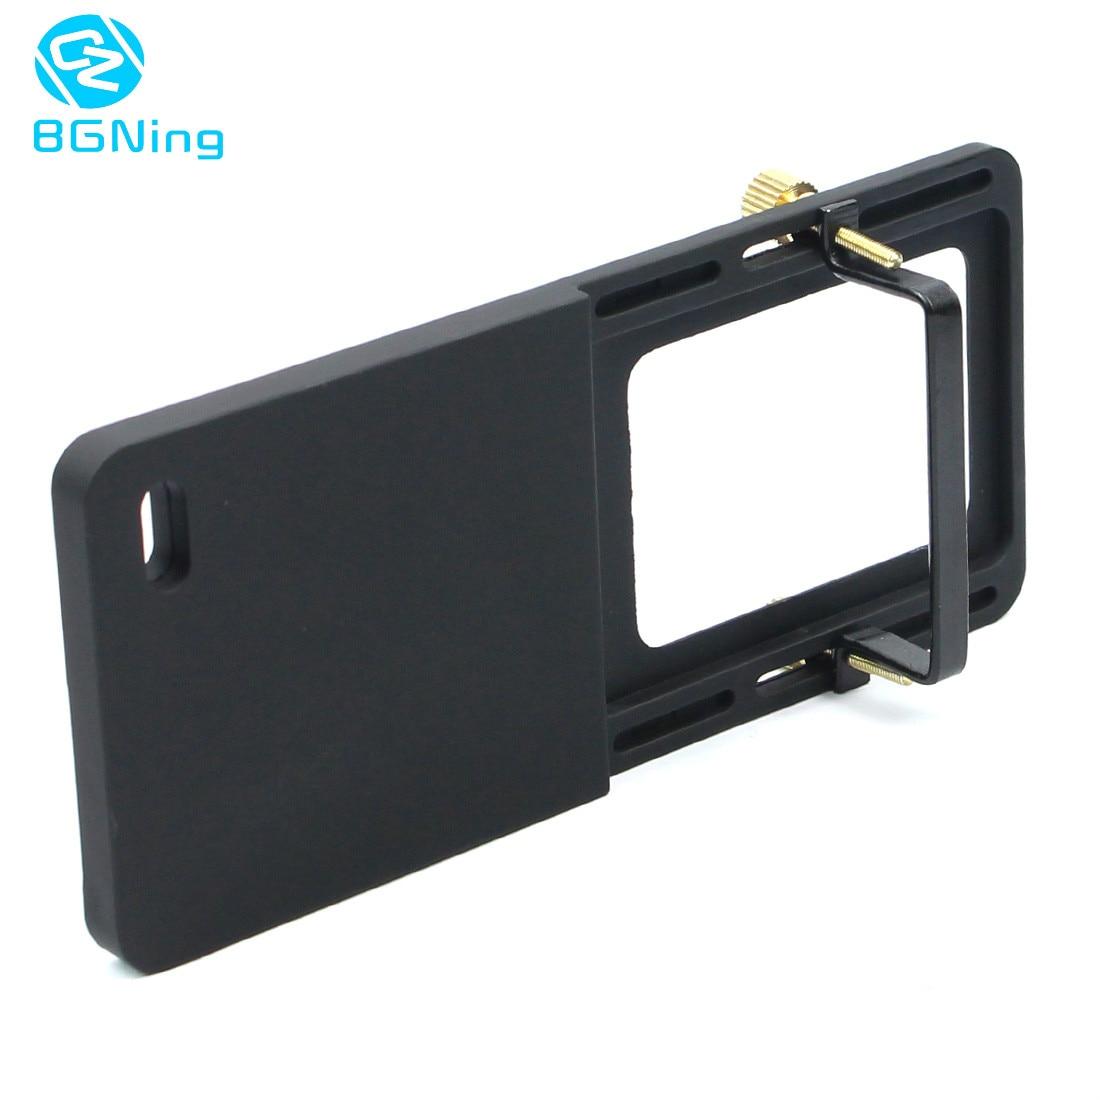 Handheld Gimbal Adapter Switch Mount Plate for GoPro Hero 3 3+ 4 Yi 4k Camera for DJI Osmo Zhiyun Smooth Q Mobile